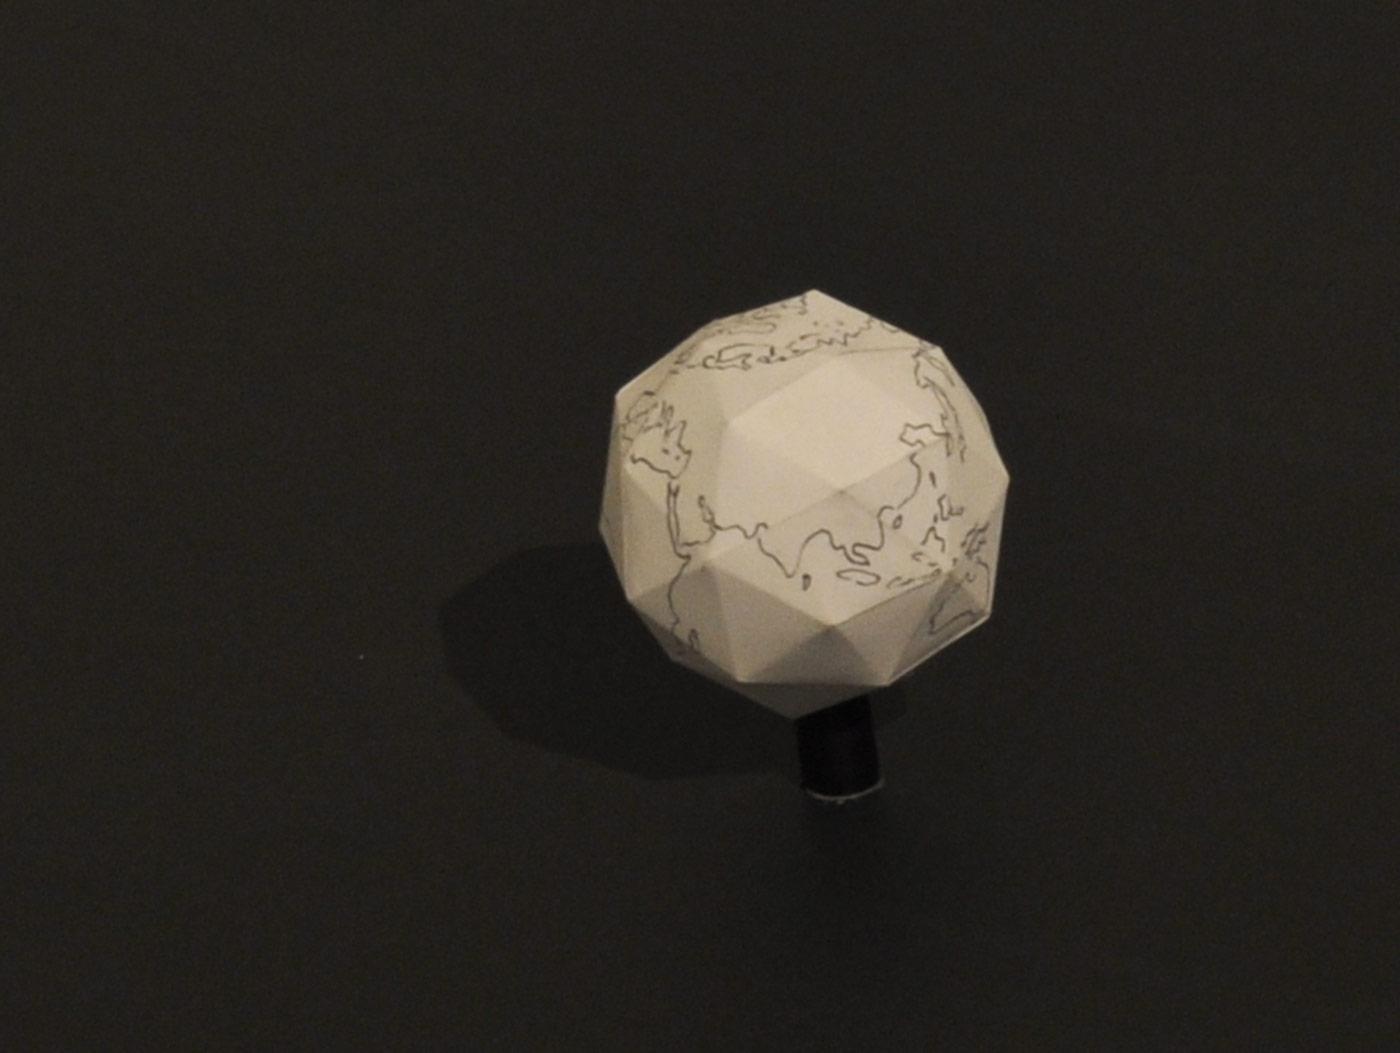 scale 1:200 000 000 paper, slate, electric motor 4W cm 120 x 90 x 20. 2013